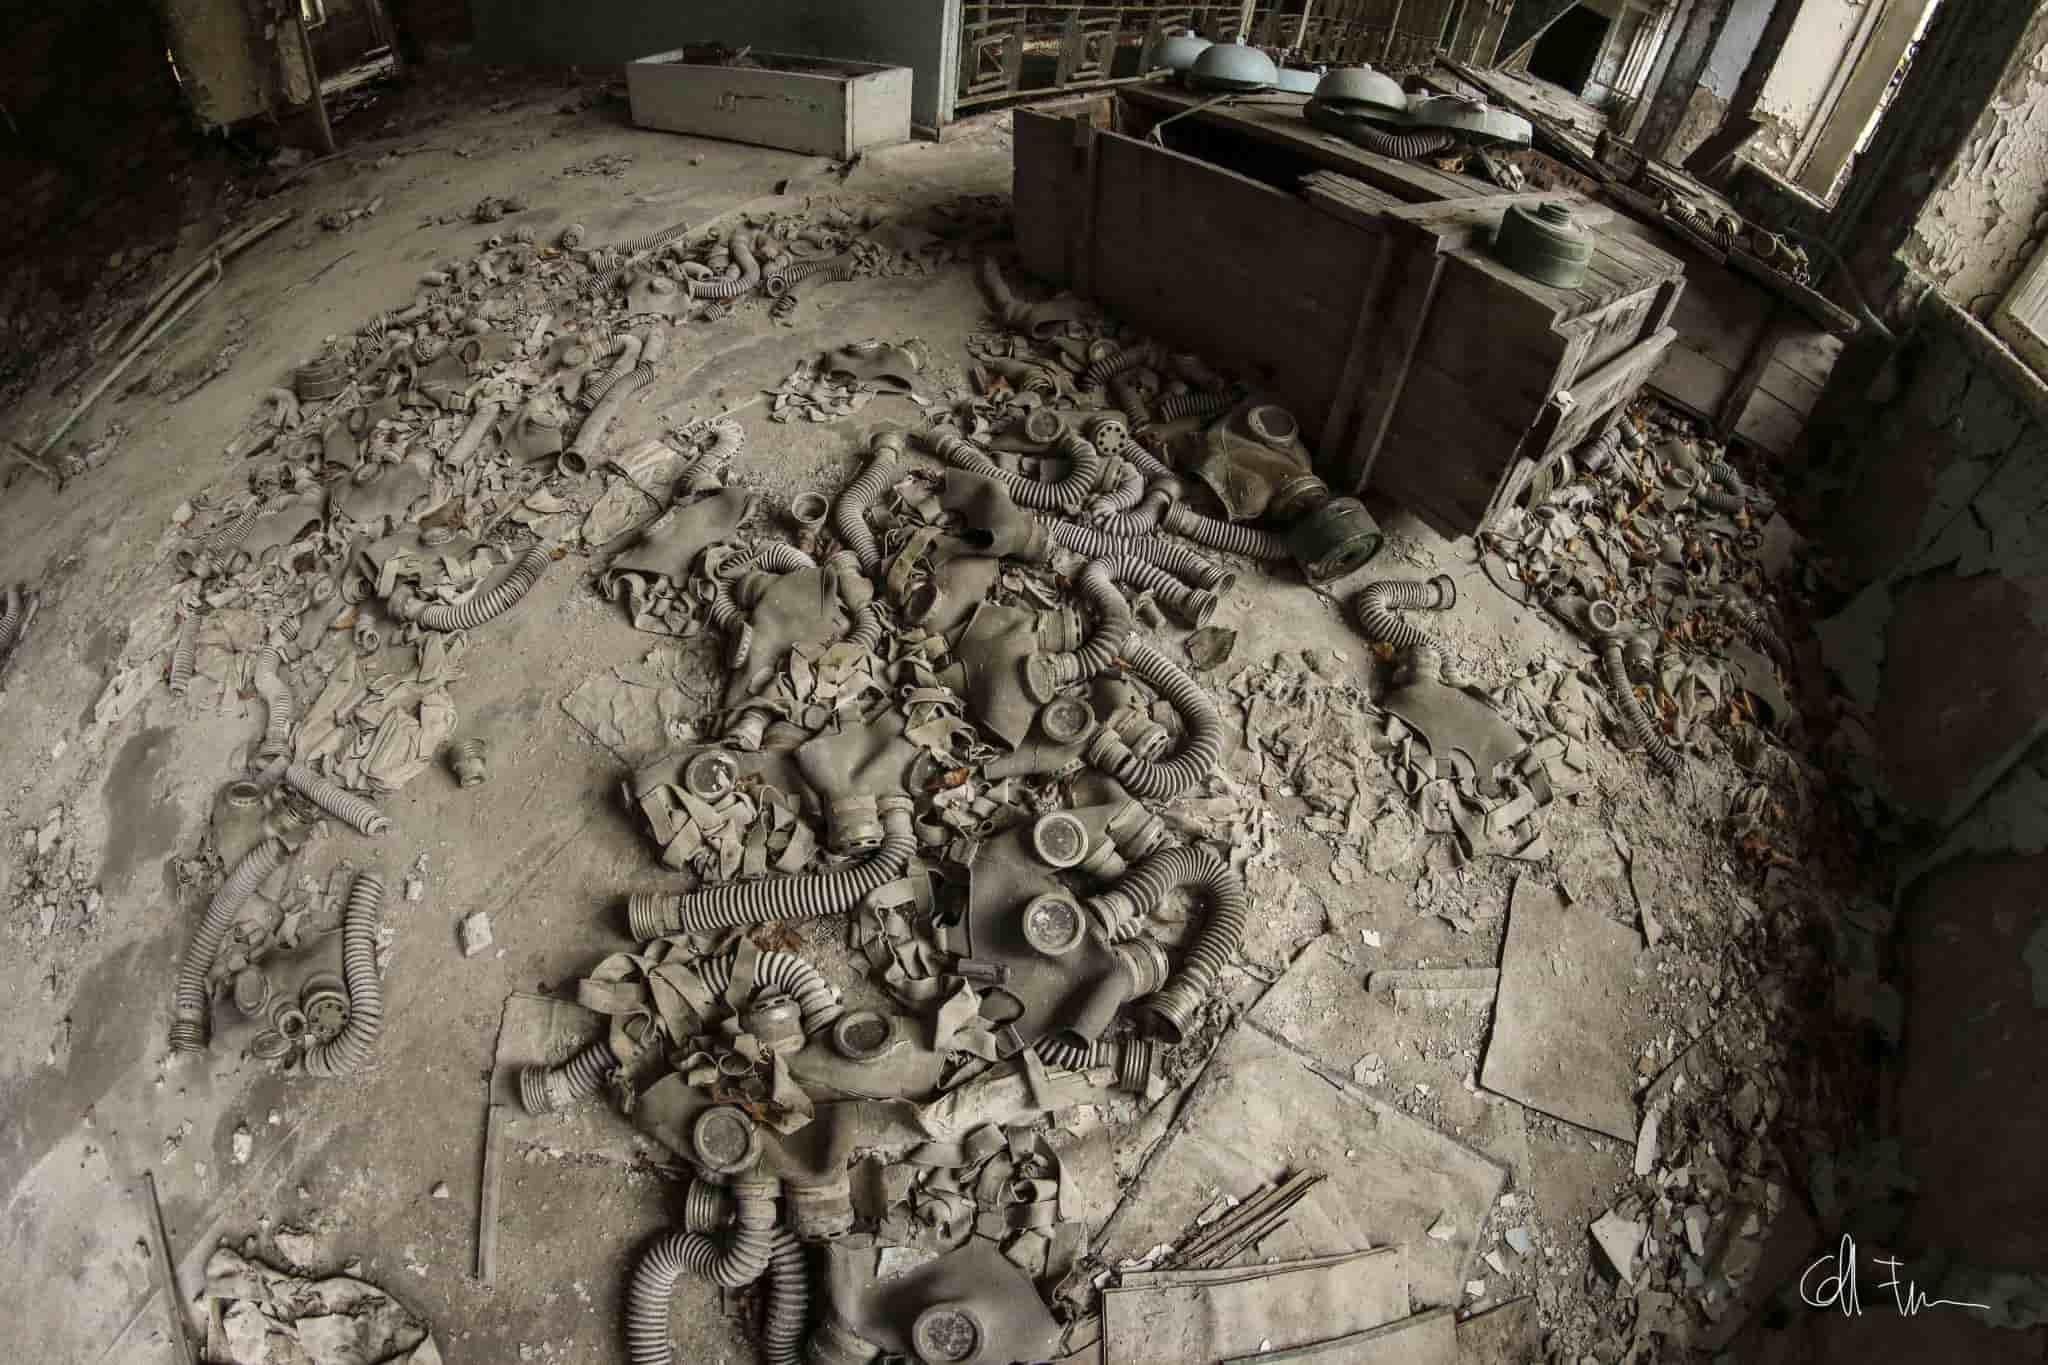 Maschere abbandonate a Chernobyl